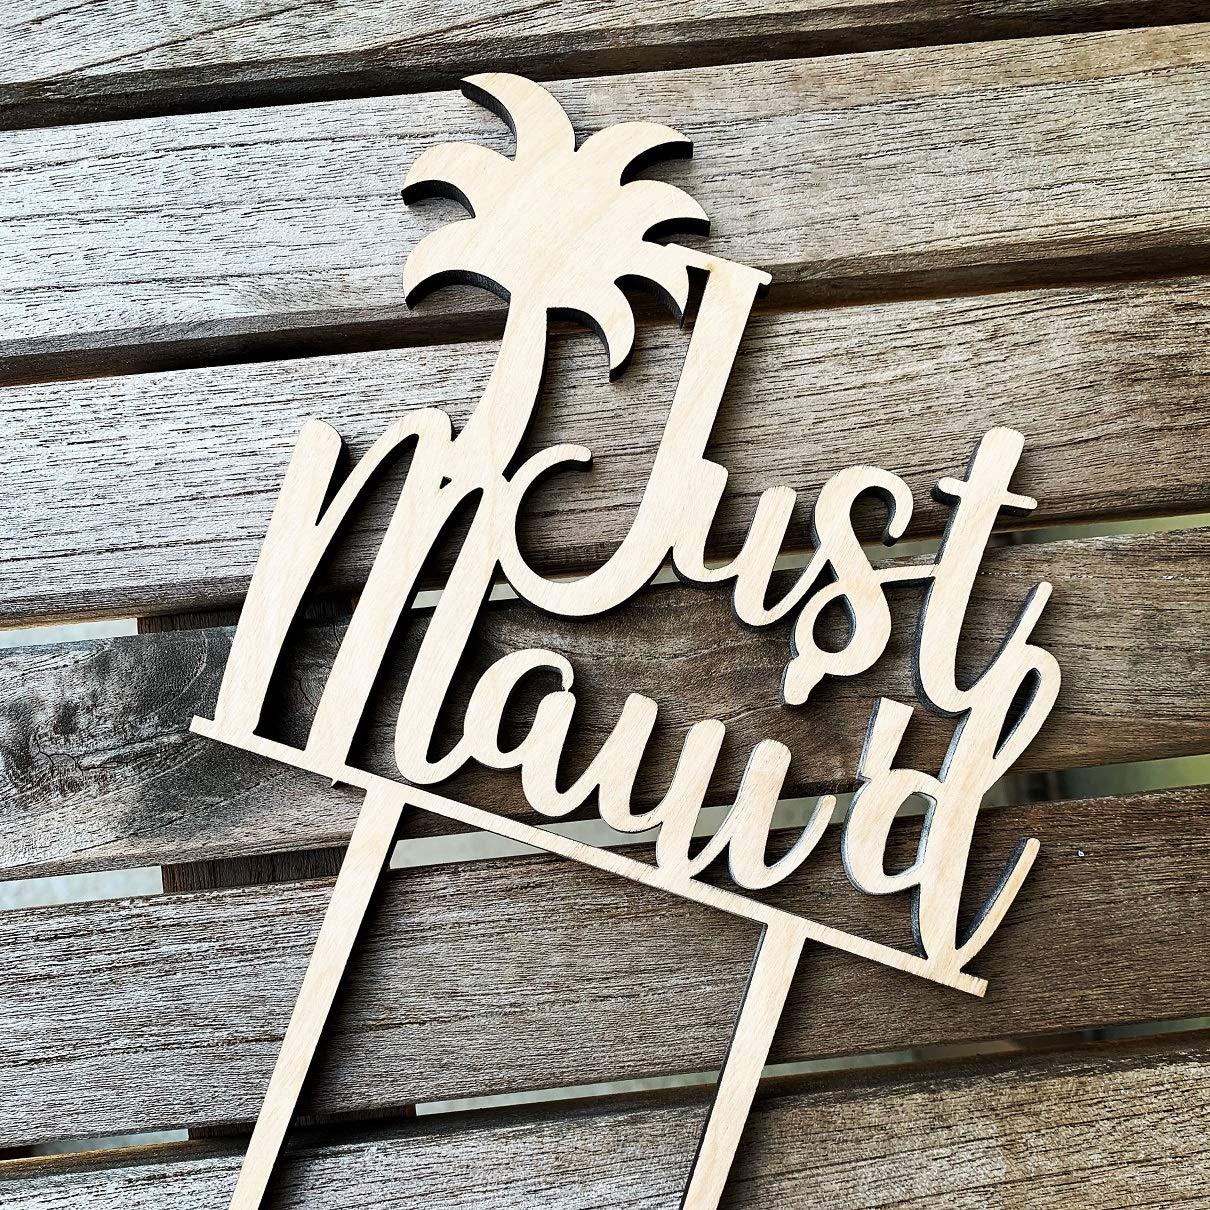 Maui/'d cake topper,bridal shower cake topper,engagement party decor,engagement party decor,bachelorette party,tropical wedding cake topper